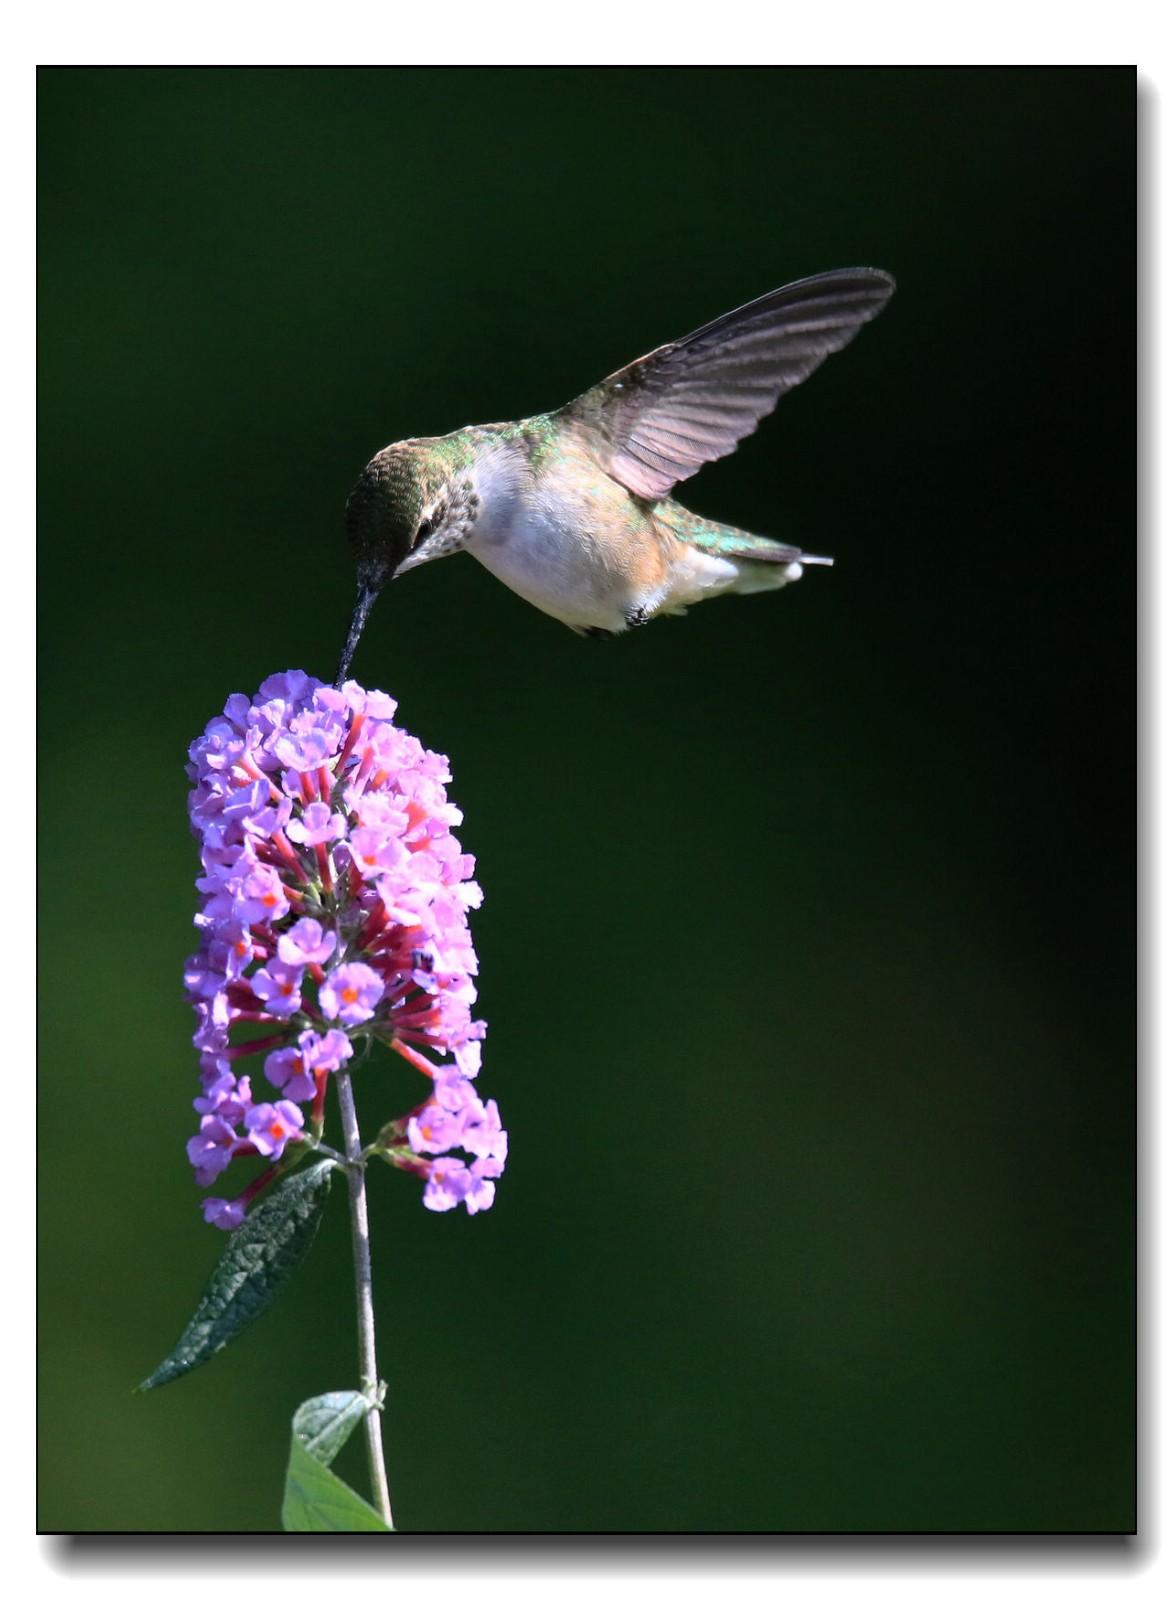 蜂鸟组图(五)_图1-16